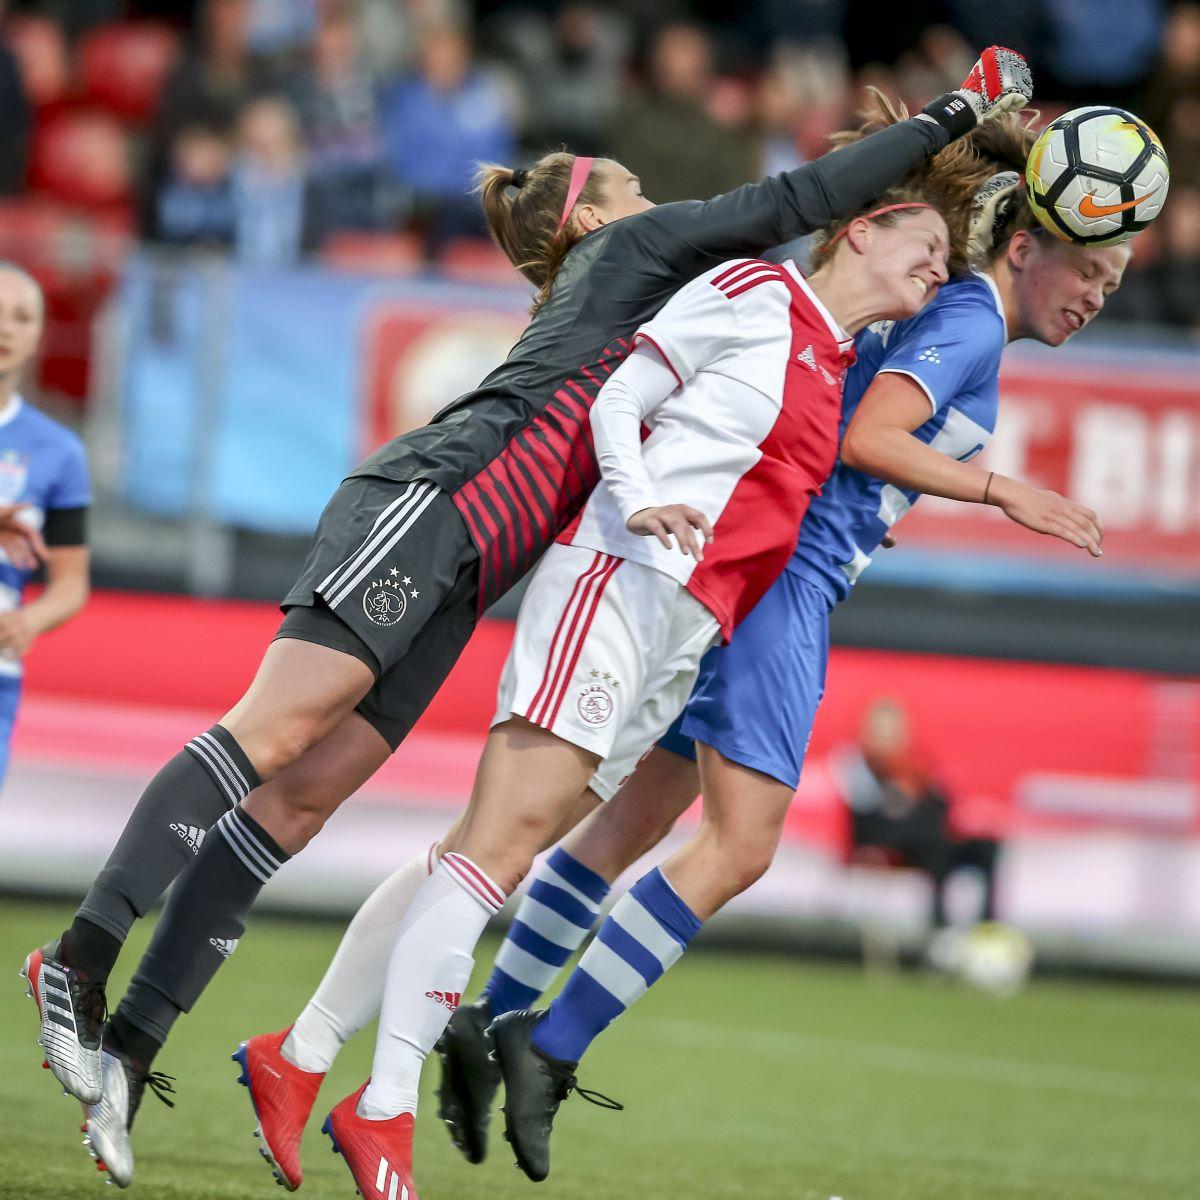 Ajax v Zwolle